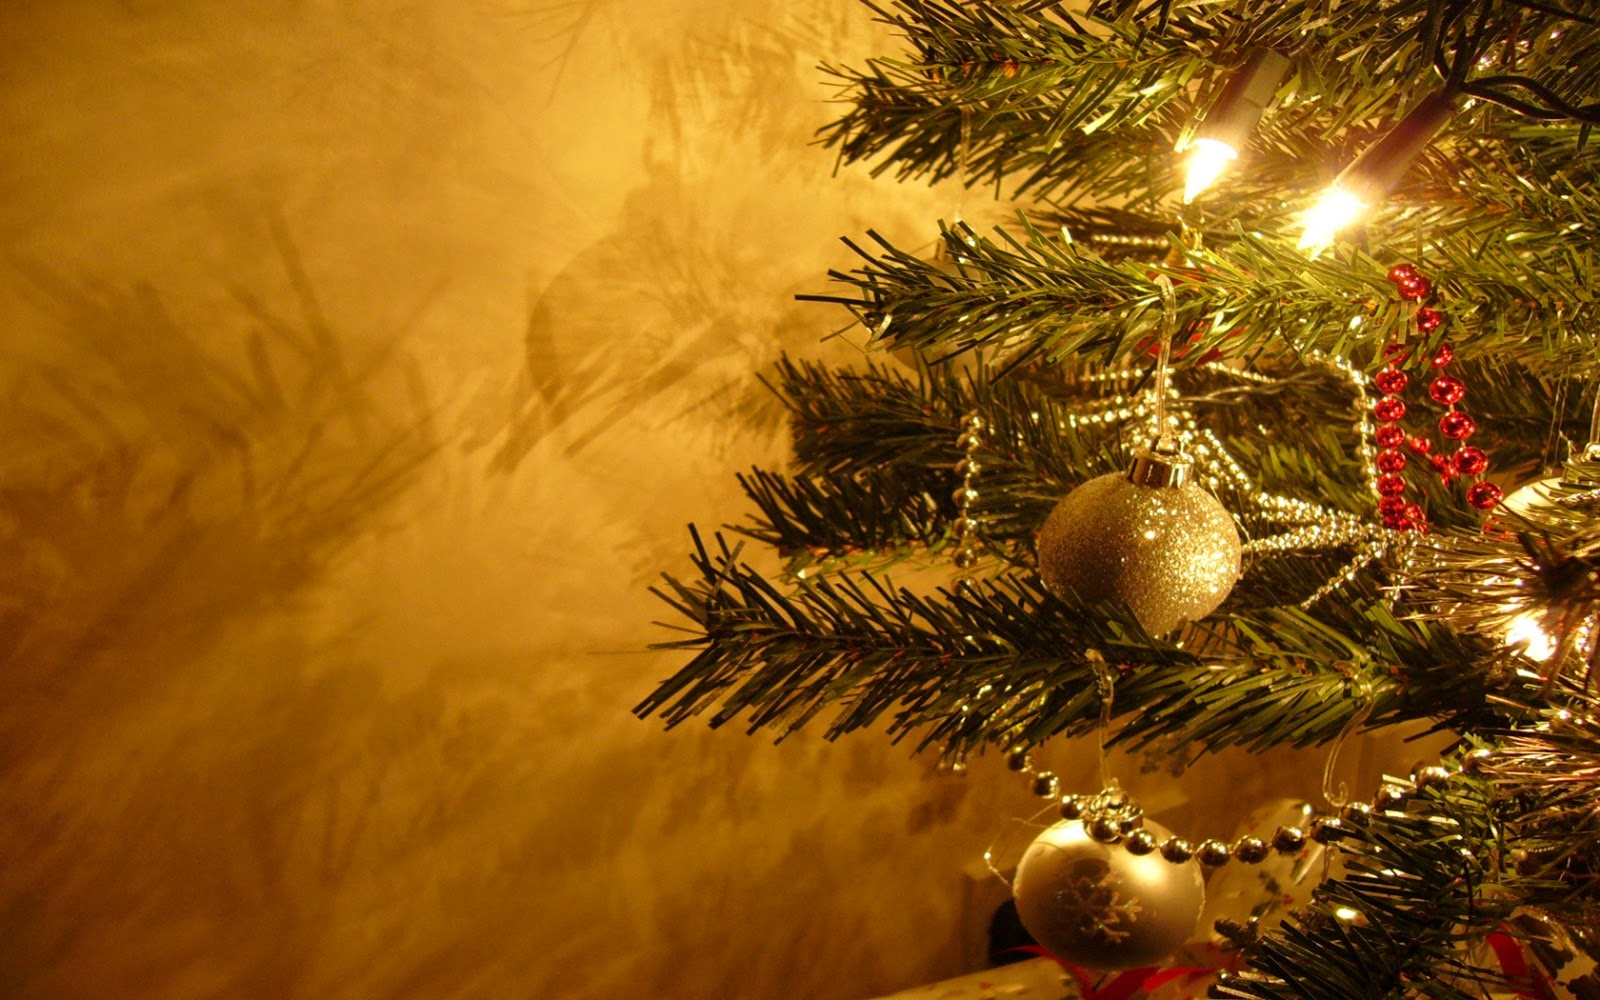 Christmas Tree In Living Room Mac Os X Wallpapers Christmas Computer Wallpaper